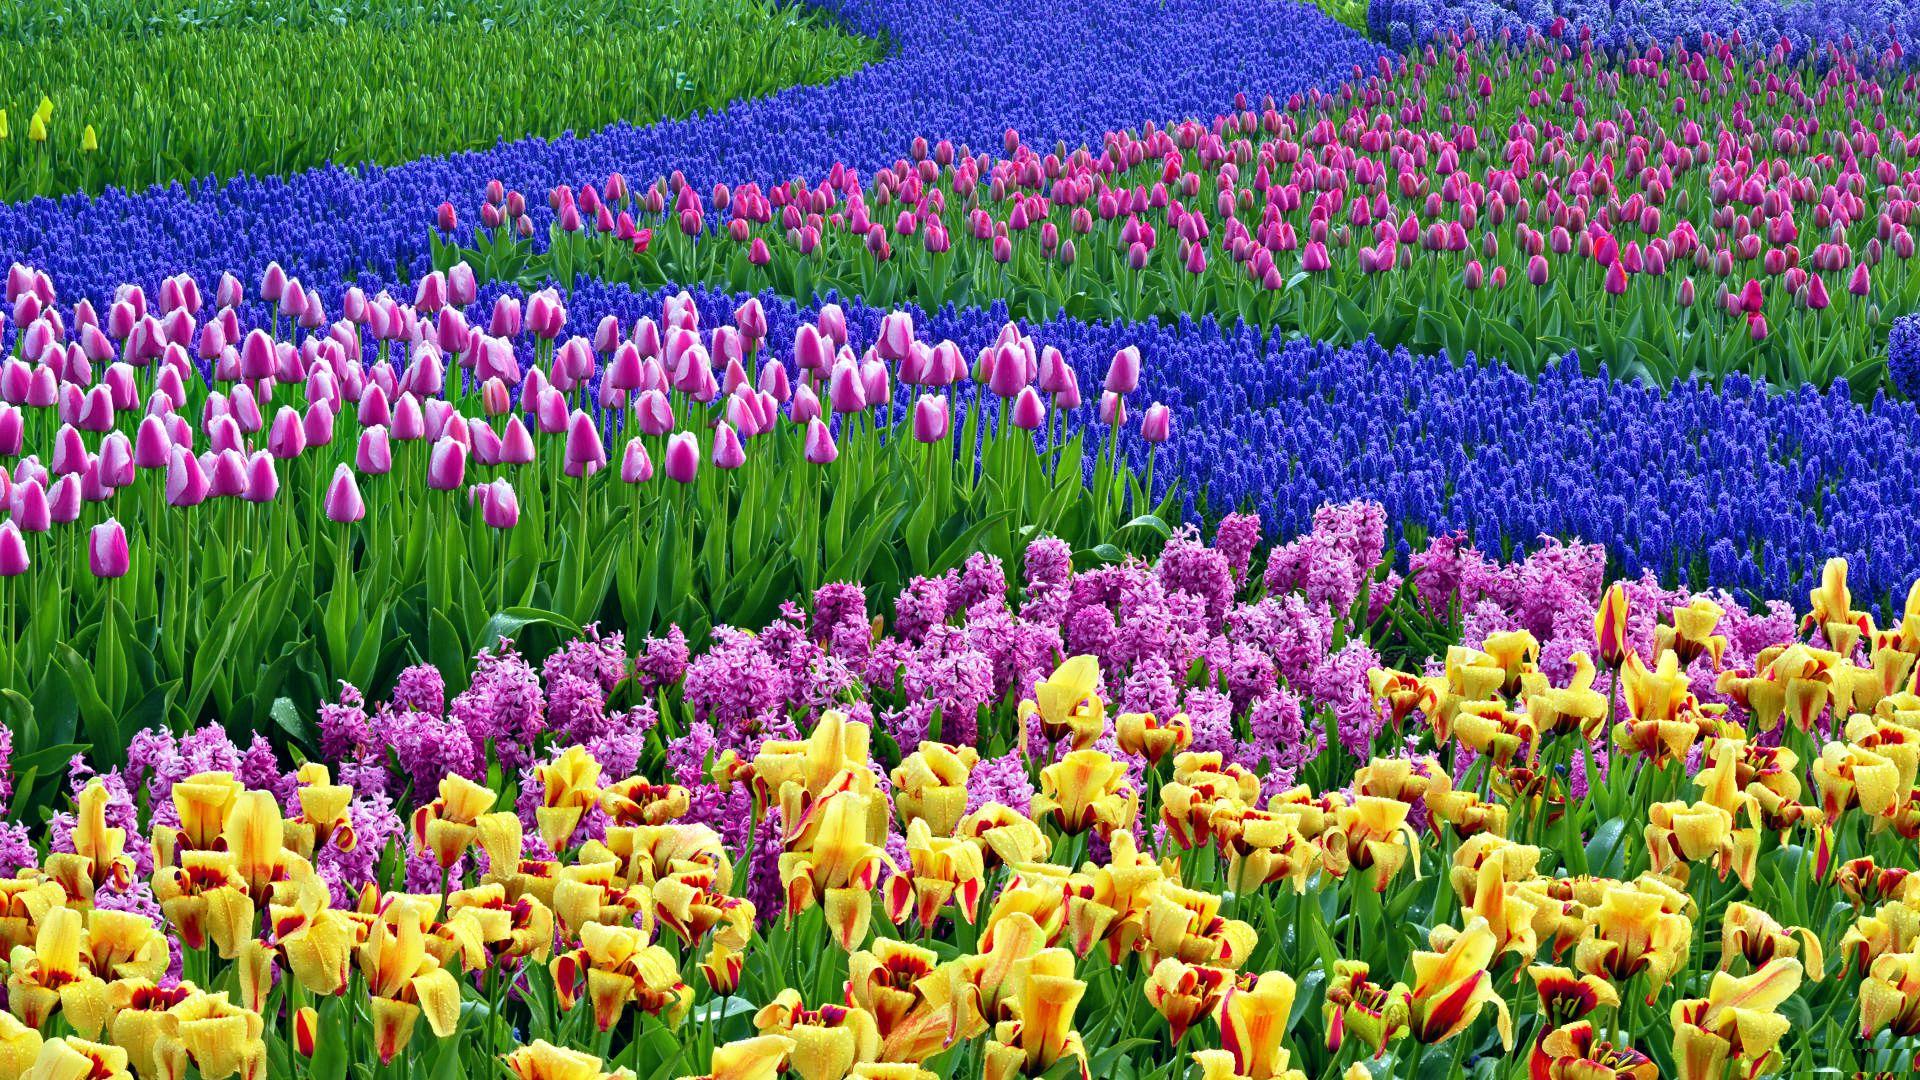 Spring Wallpapers Desktop High Quality   Spring Flowers Desktop 1920x1080